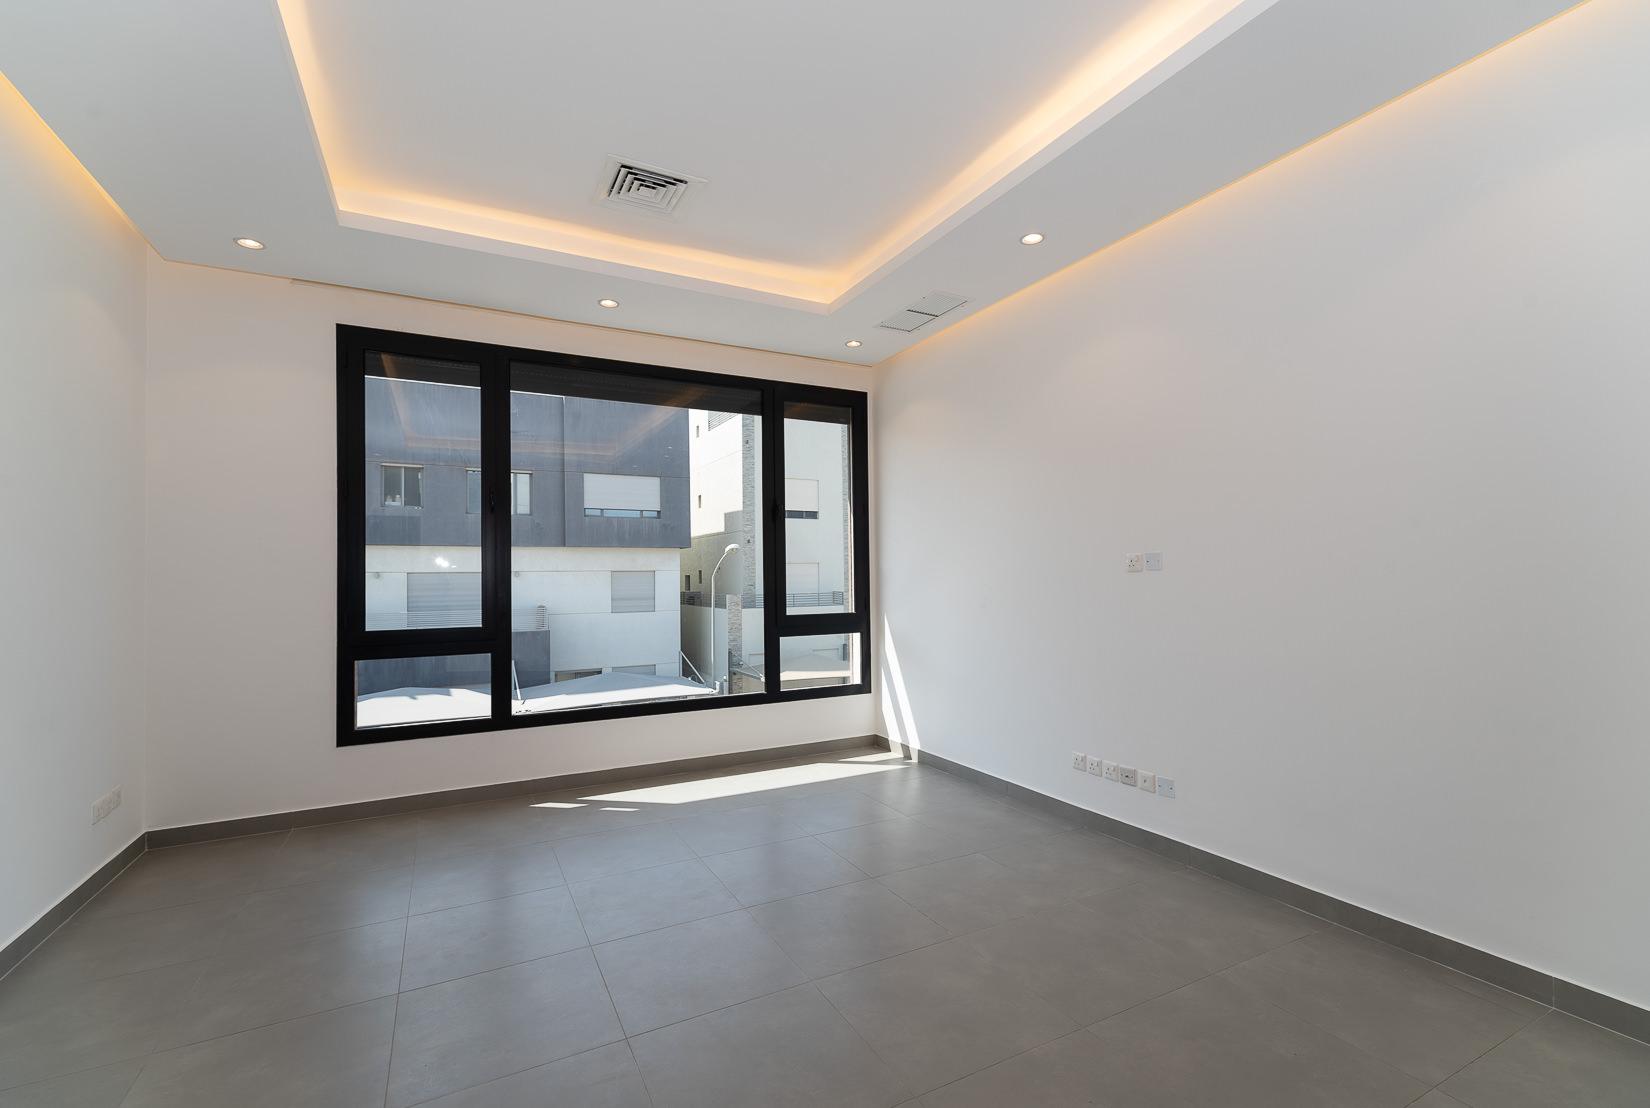 Fnaiteess – Sunny 3 bedrooms apartment